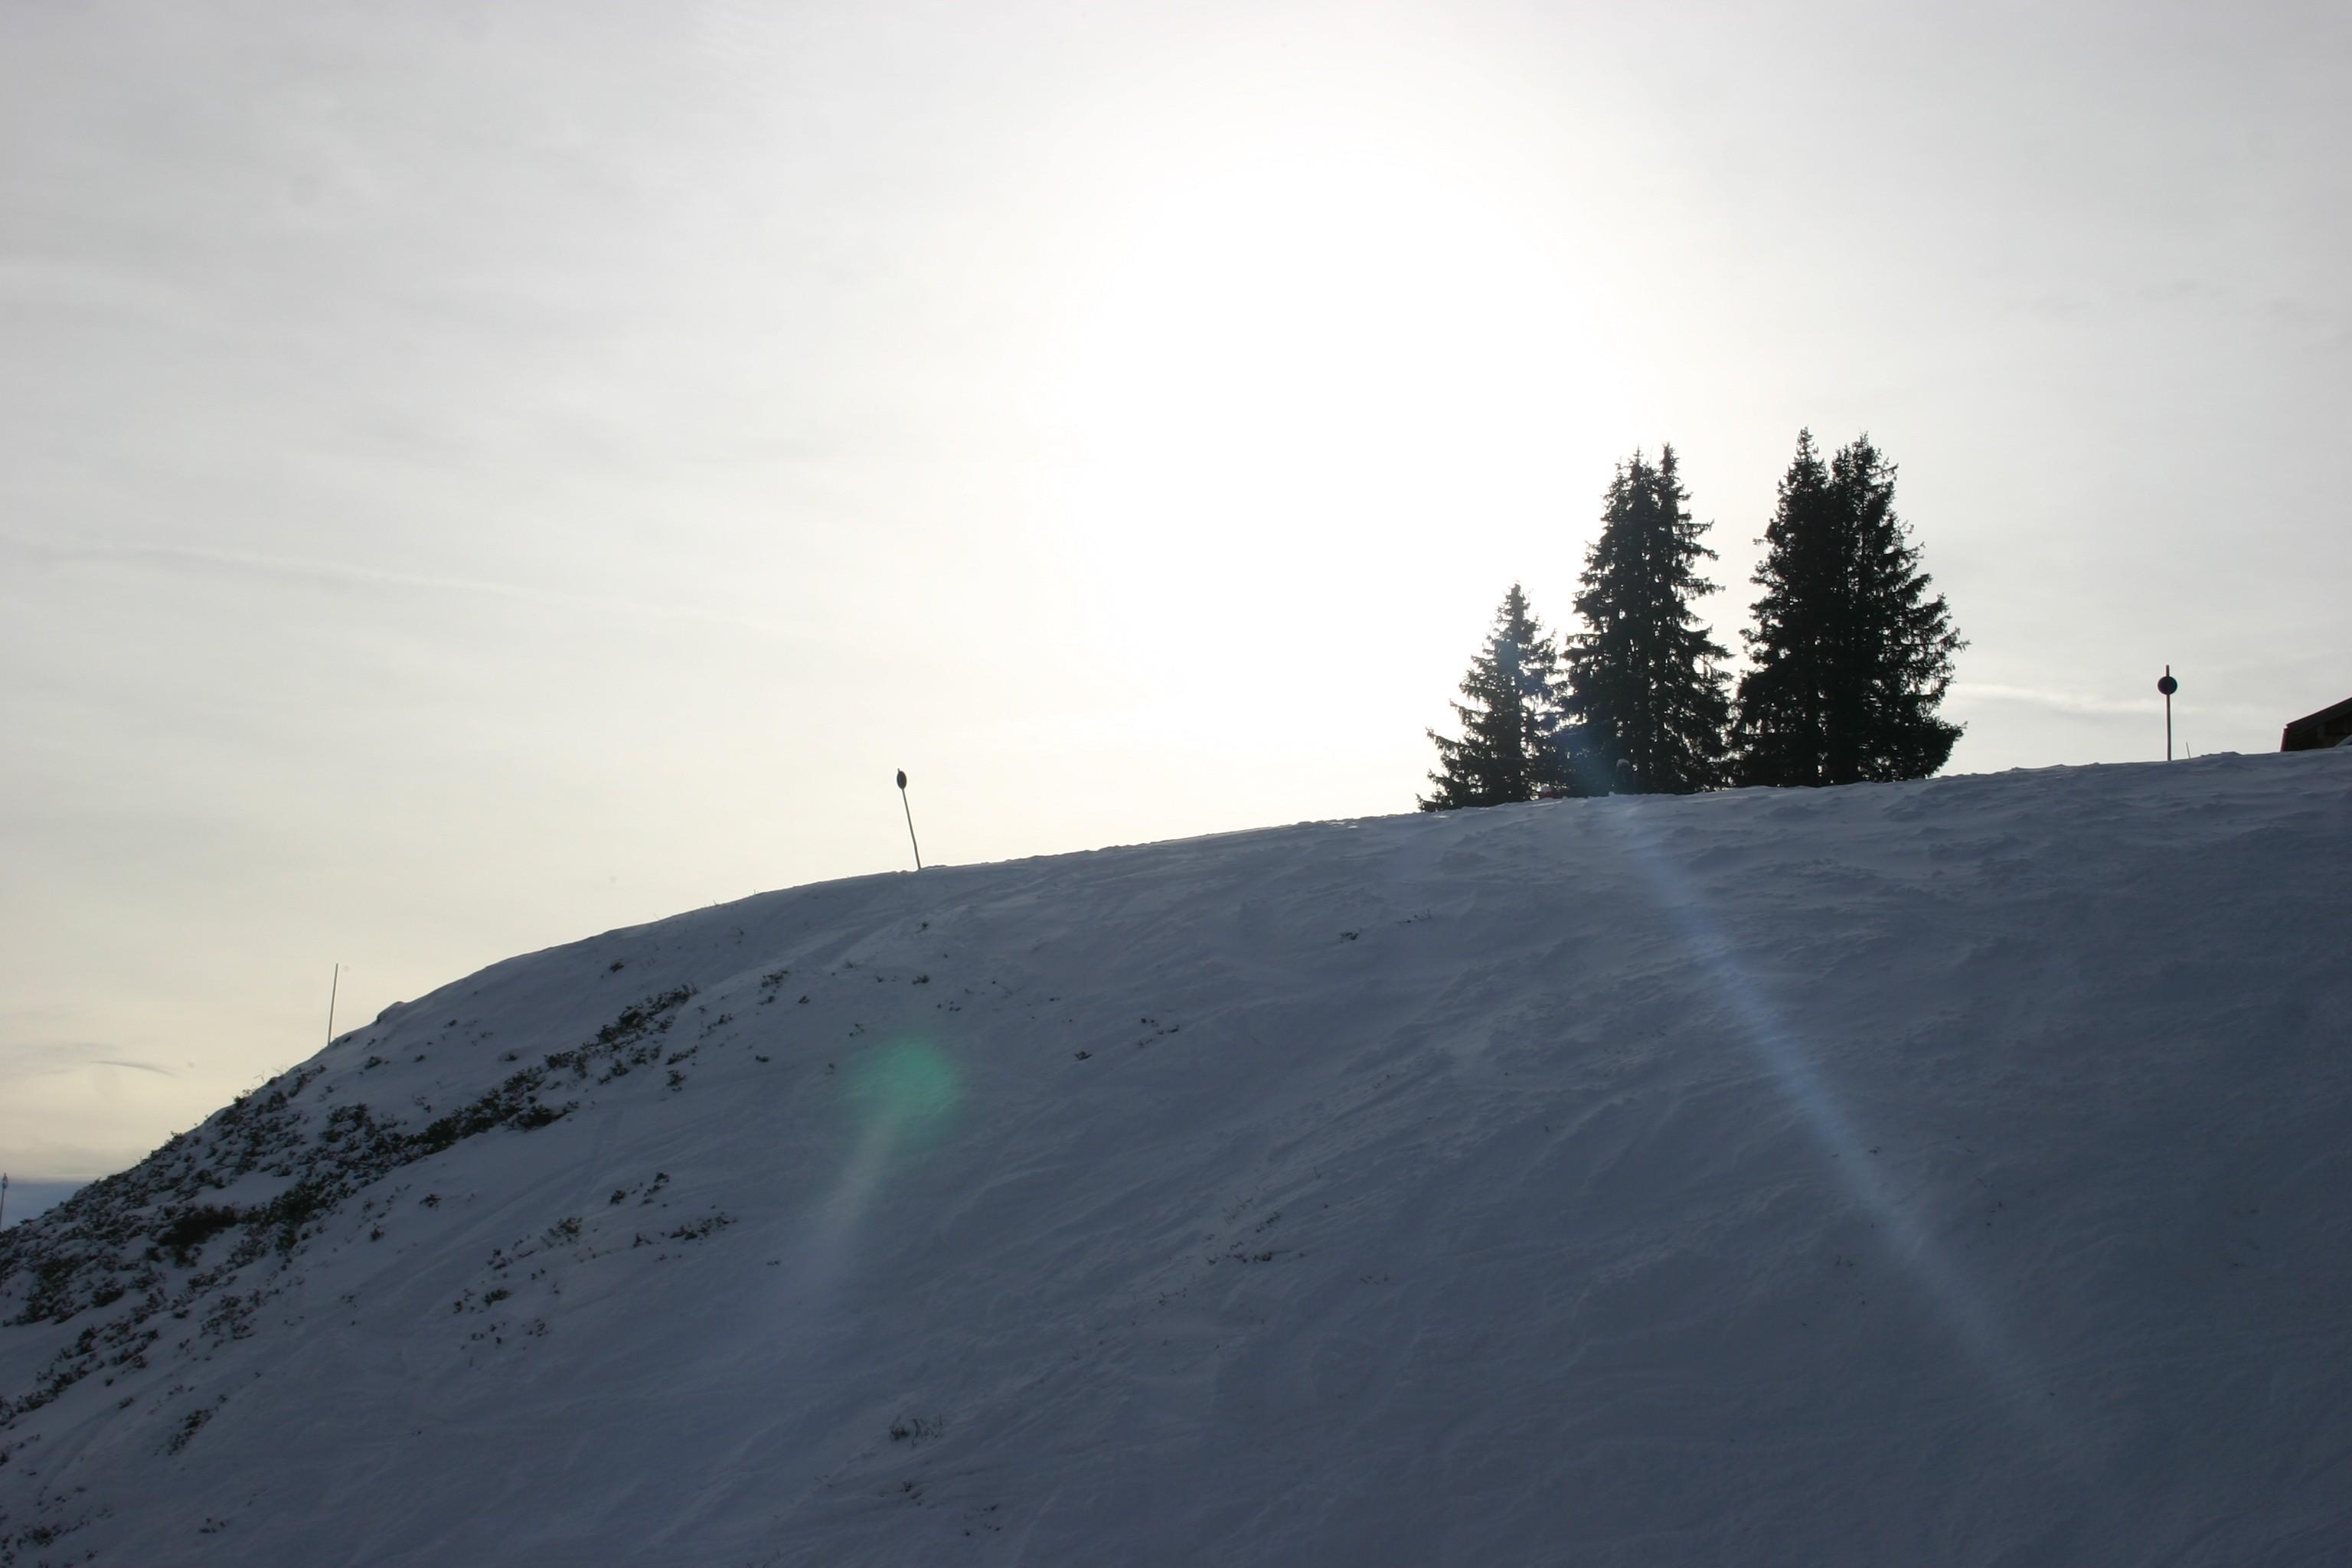 Skicircus Saalbach Hinterglemm Leogang 264 - Dag 3